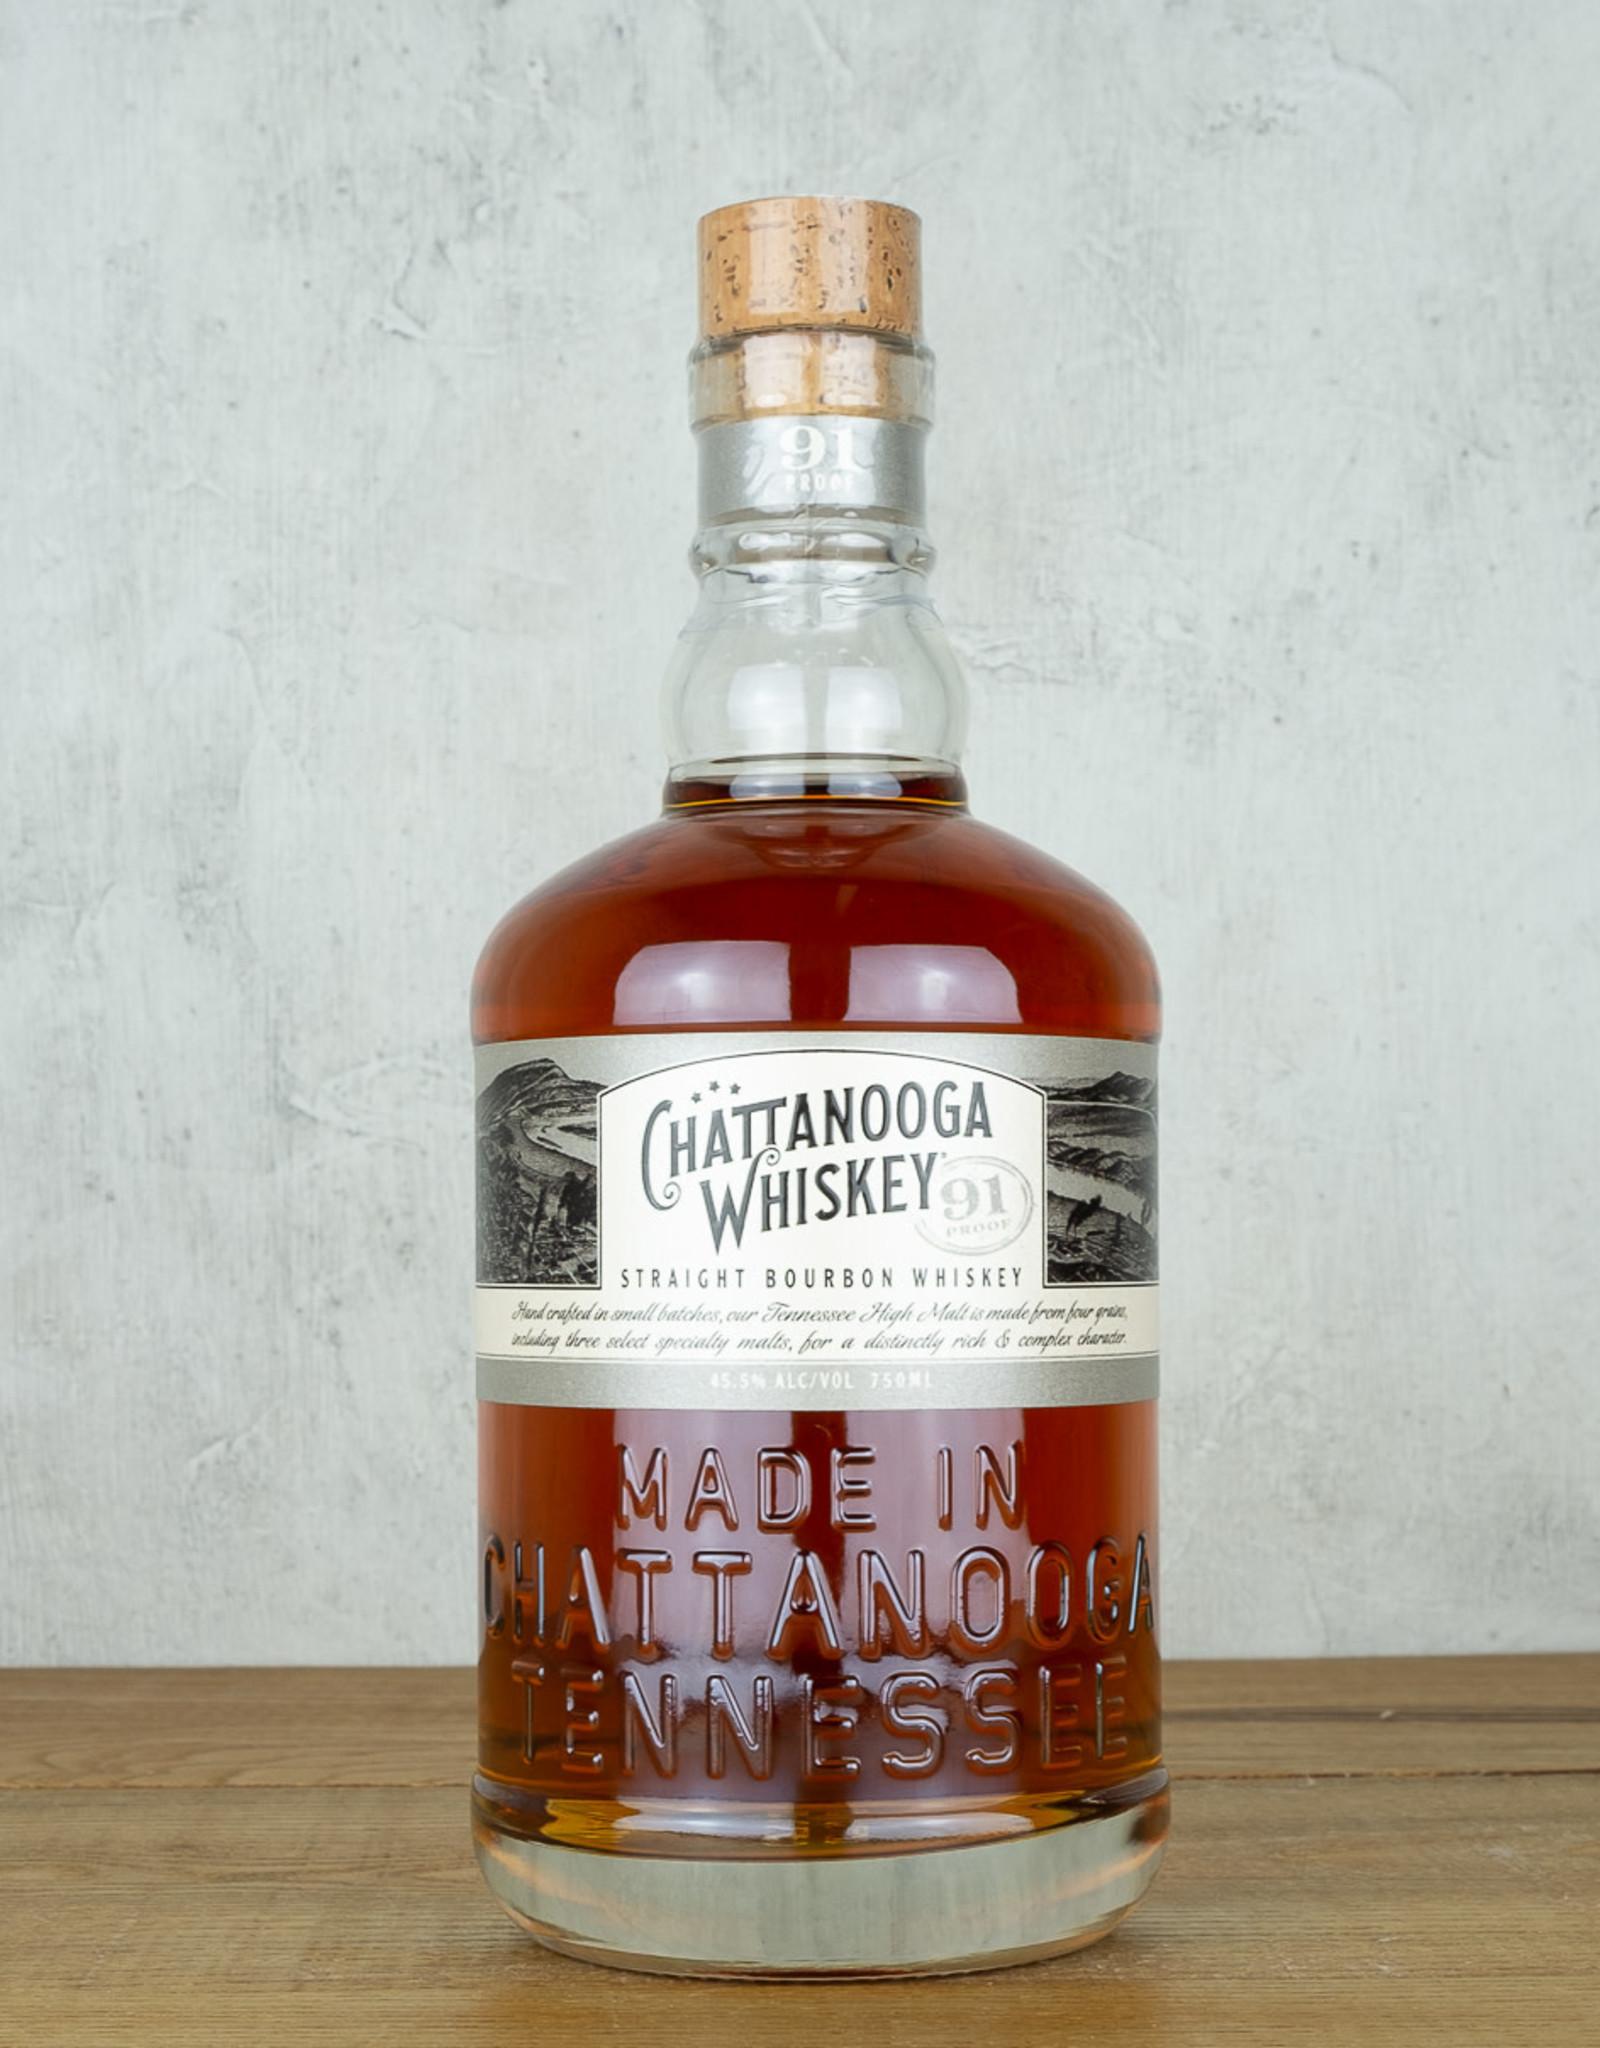 Chattanooga Whiskey 91